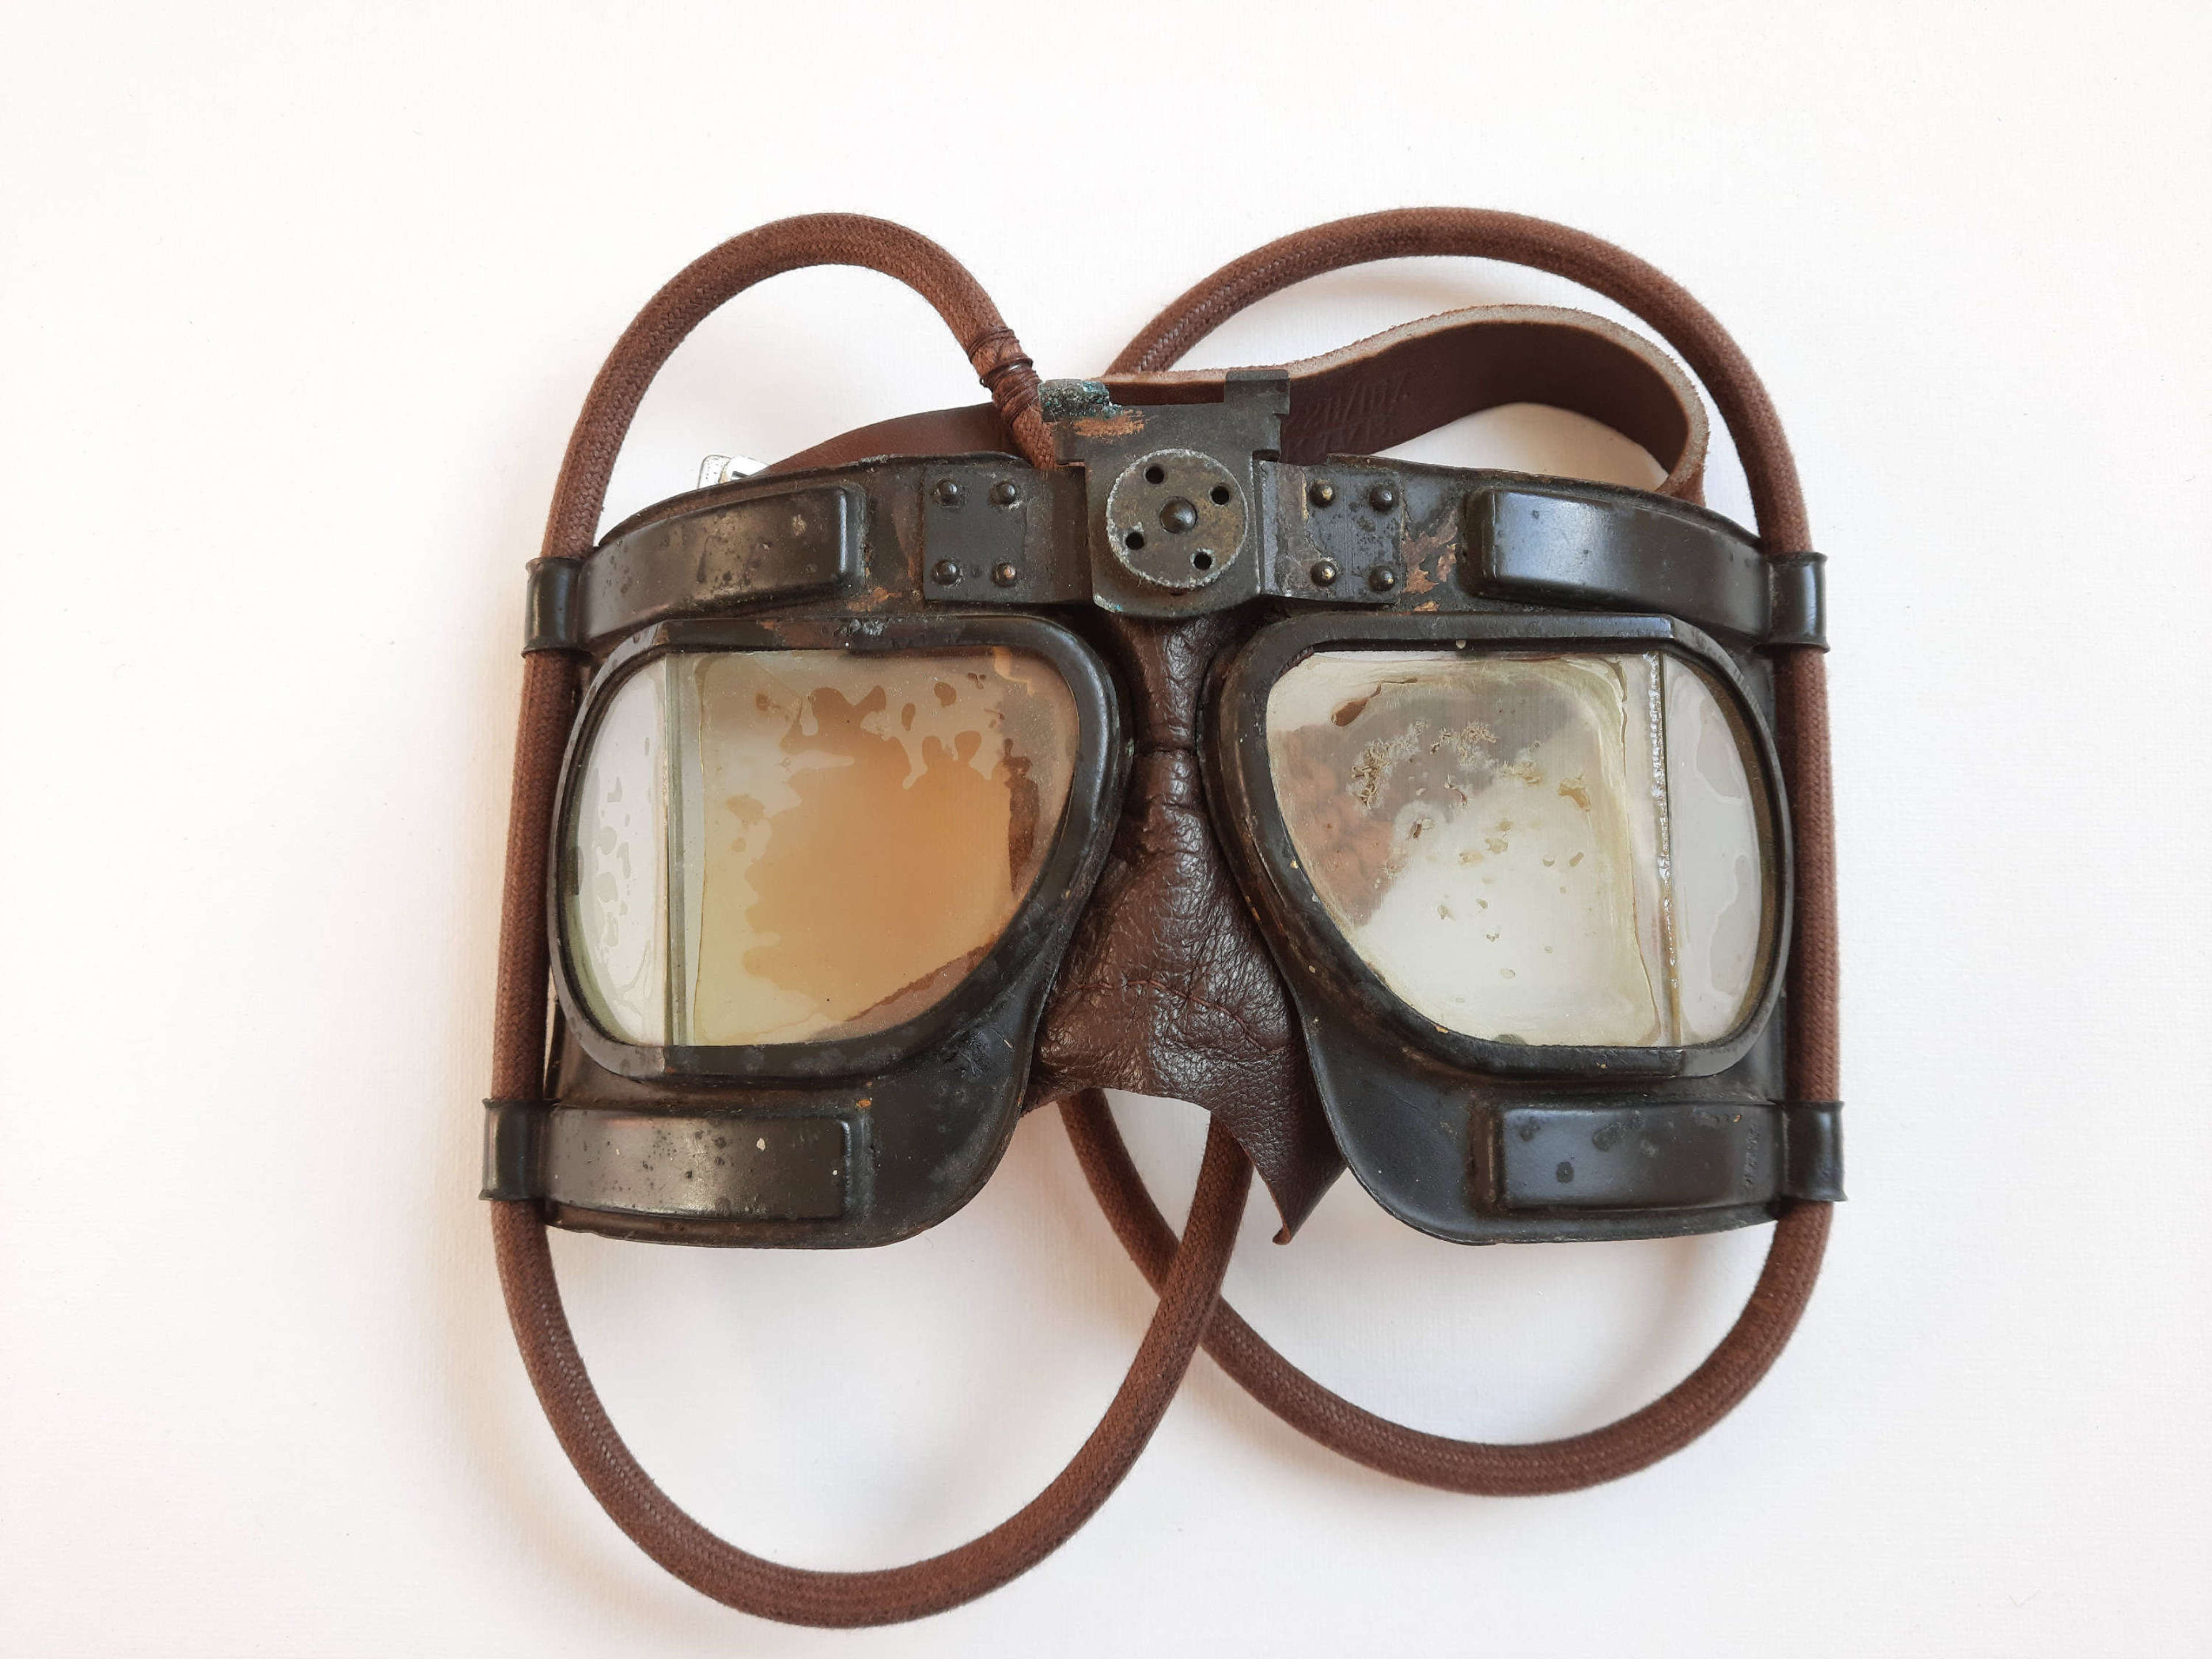 RAF MKIVB Flying Goggles